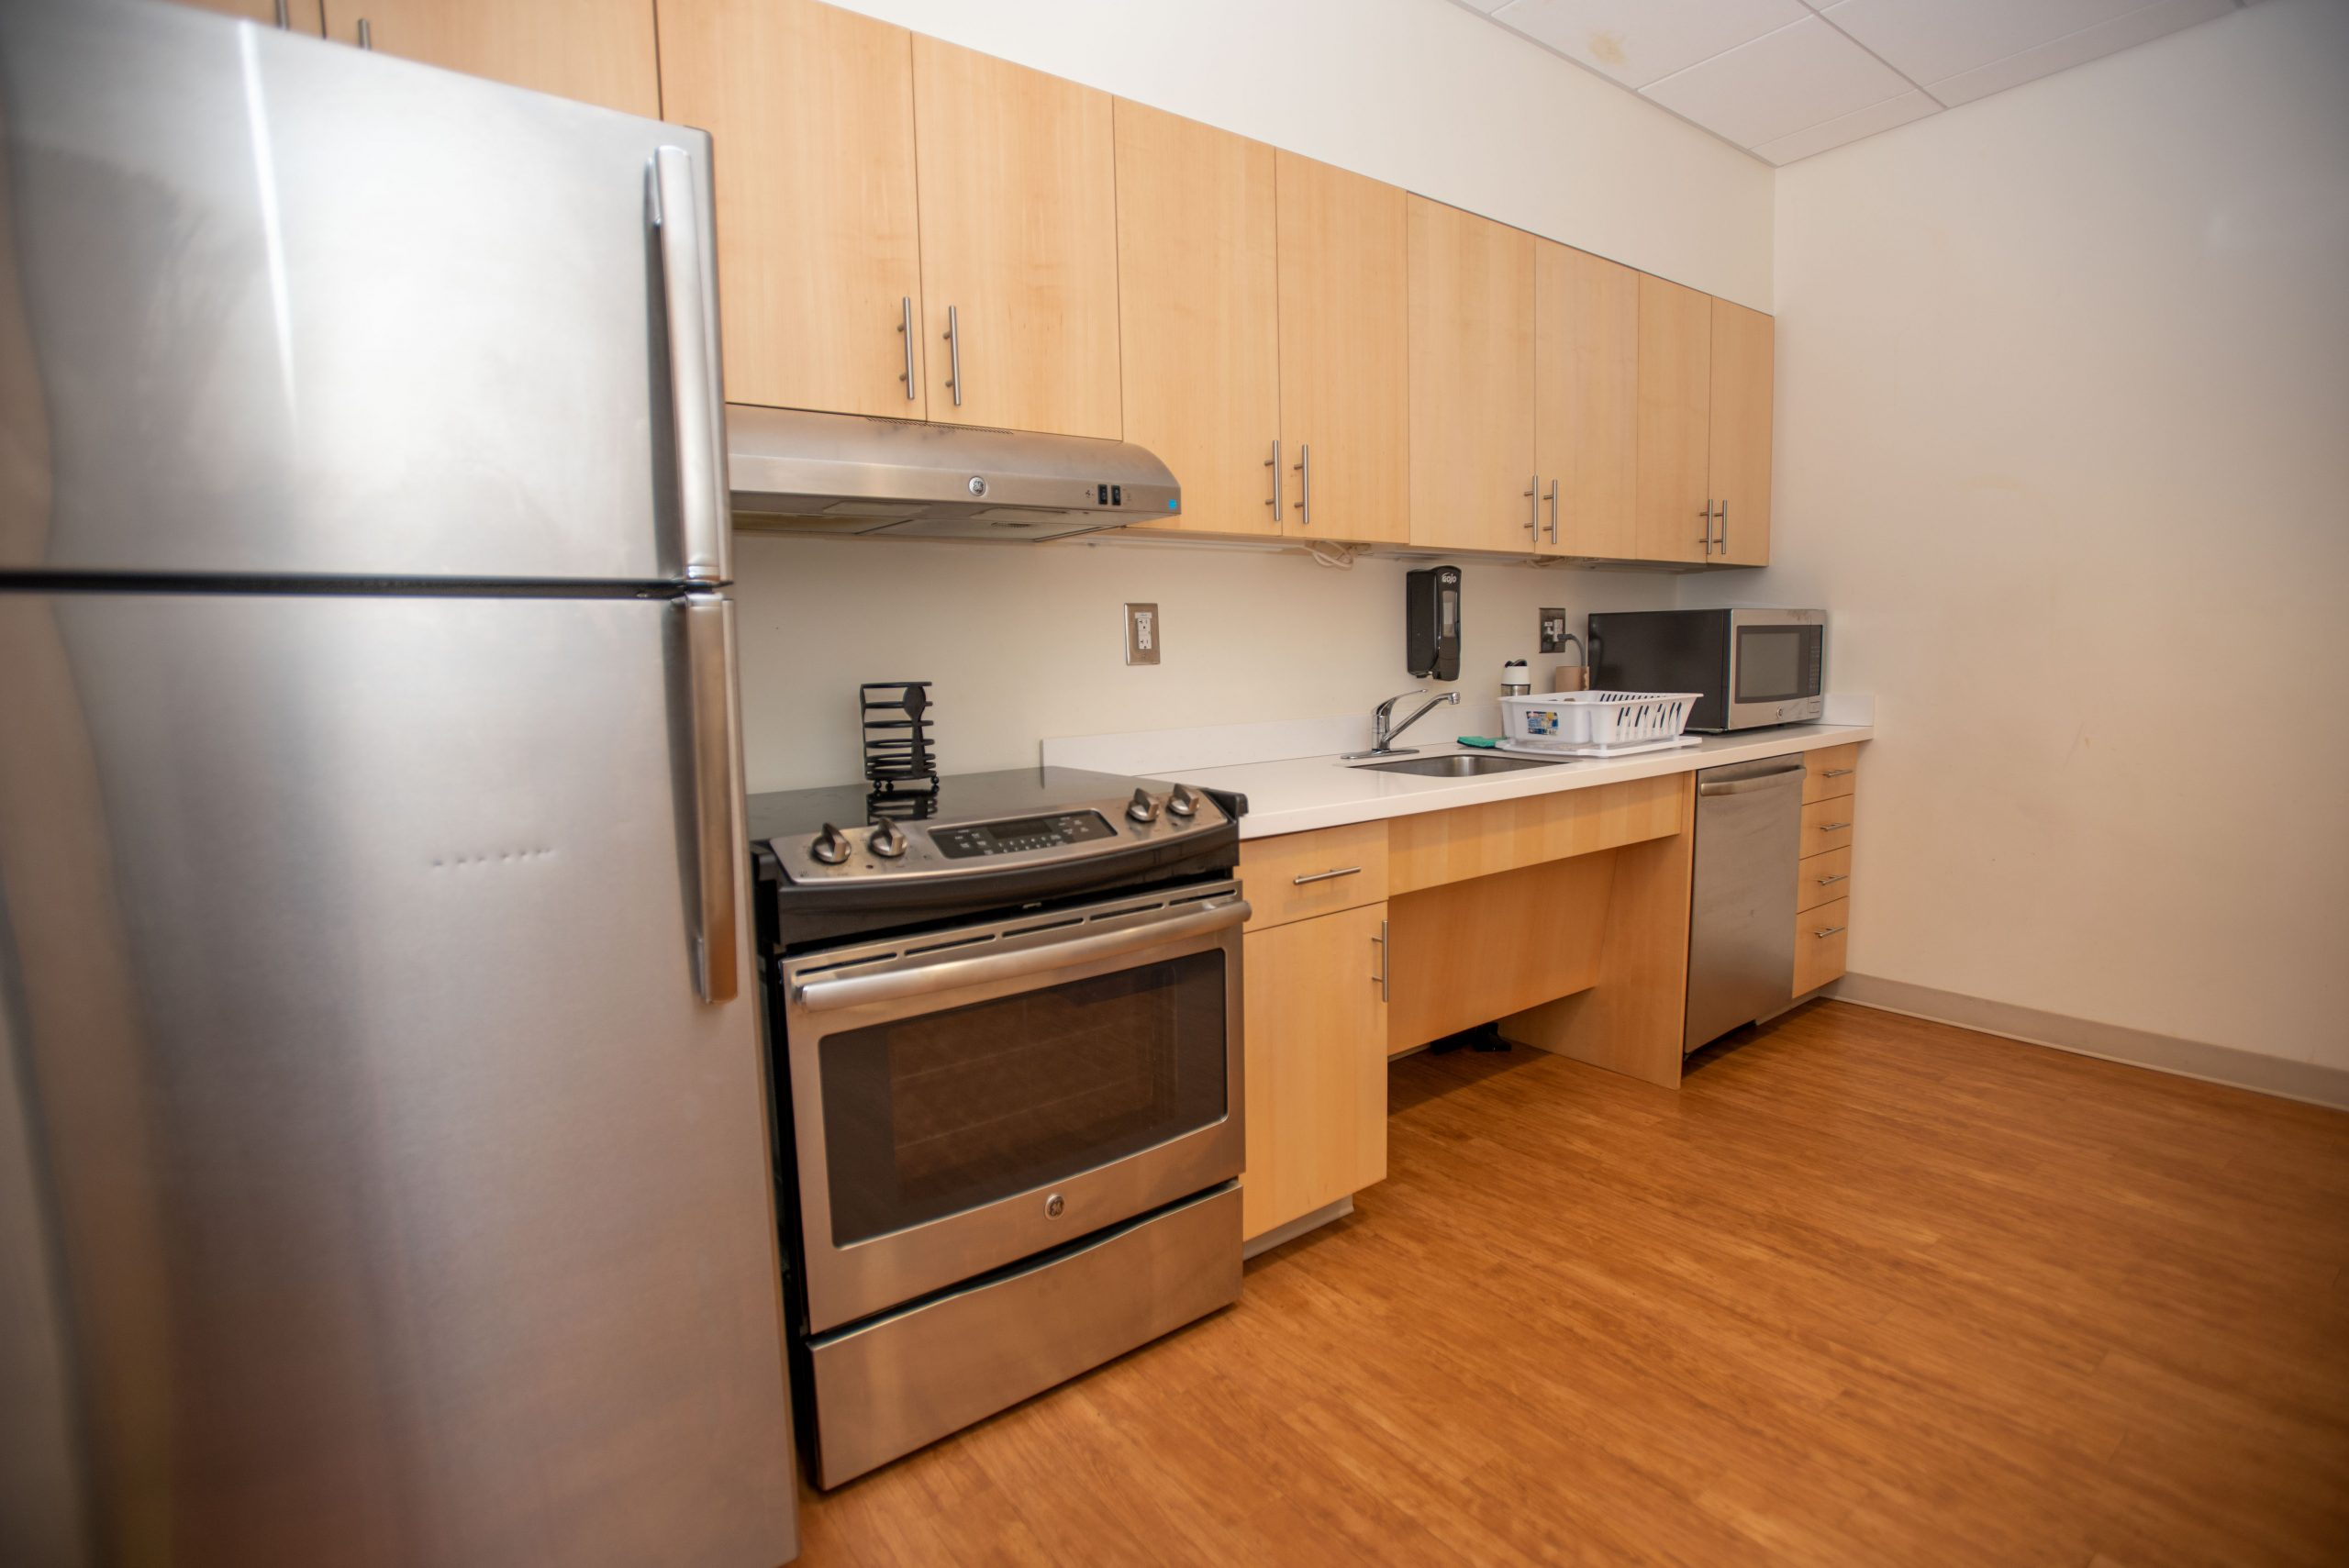 Werth residence hall kitchen area